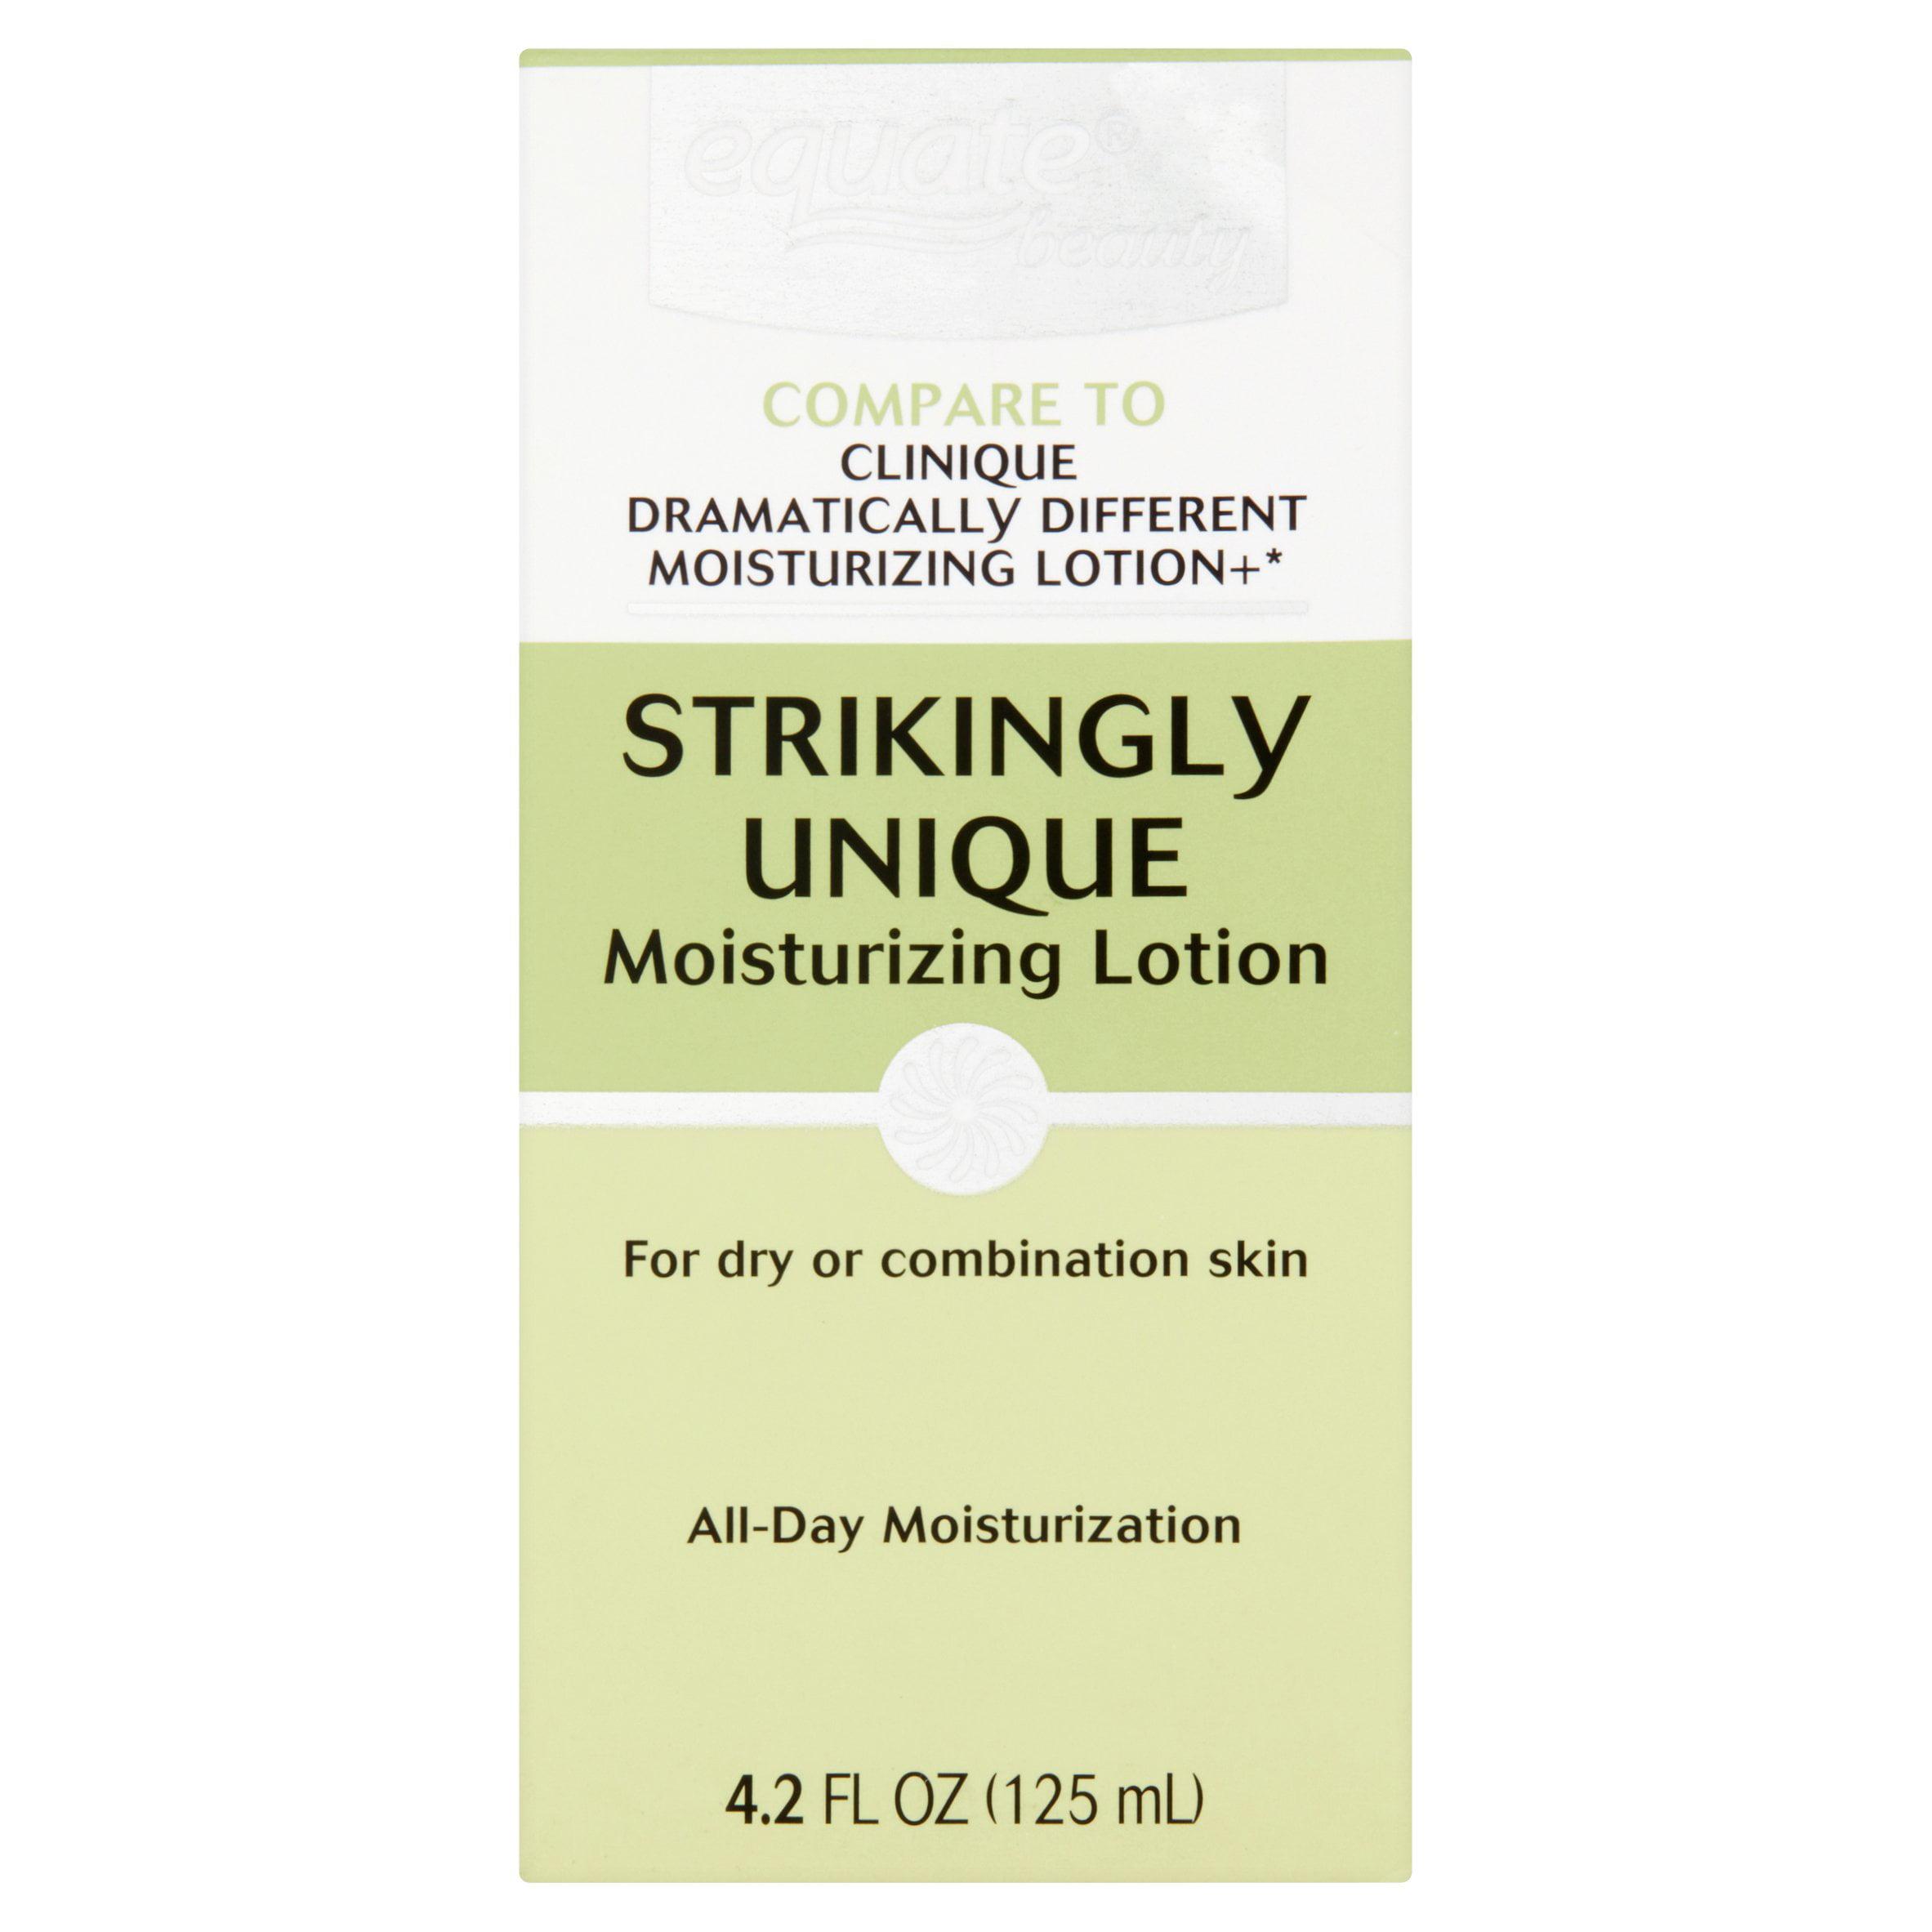 Equate Beauty Strikingly Unique Moisturizing Lotion, 4.2 Oz